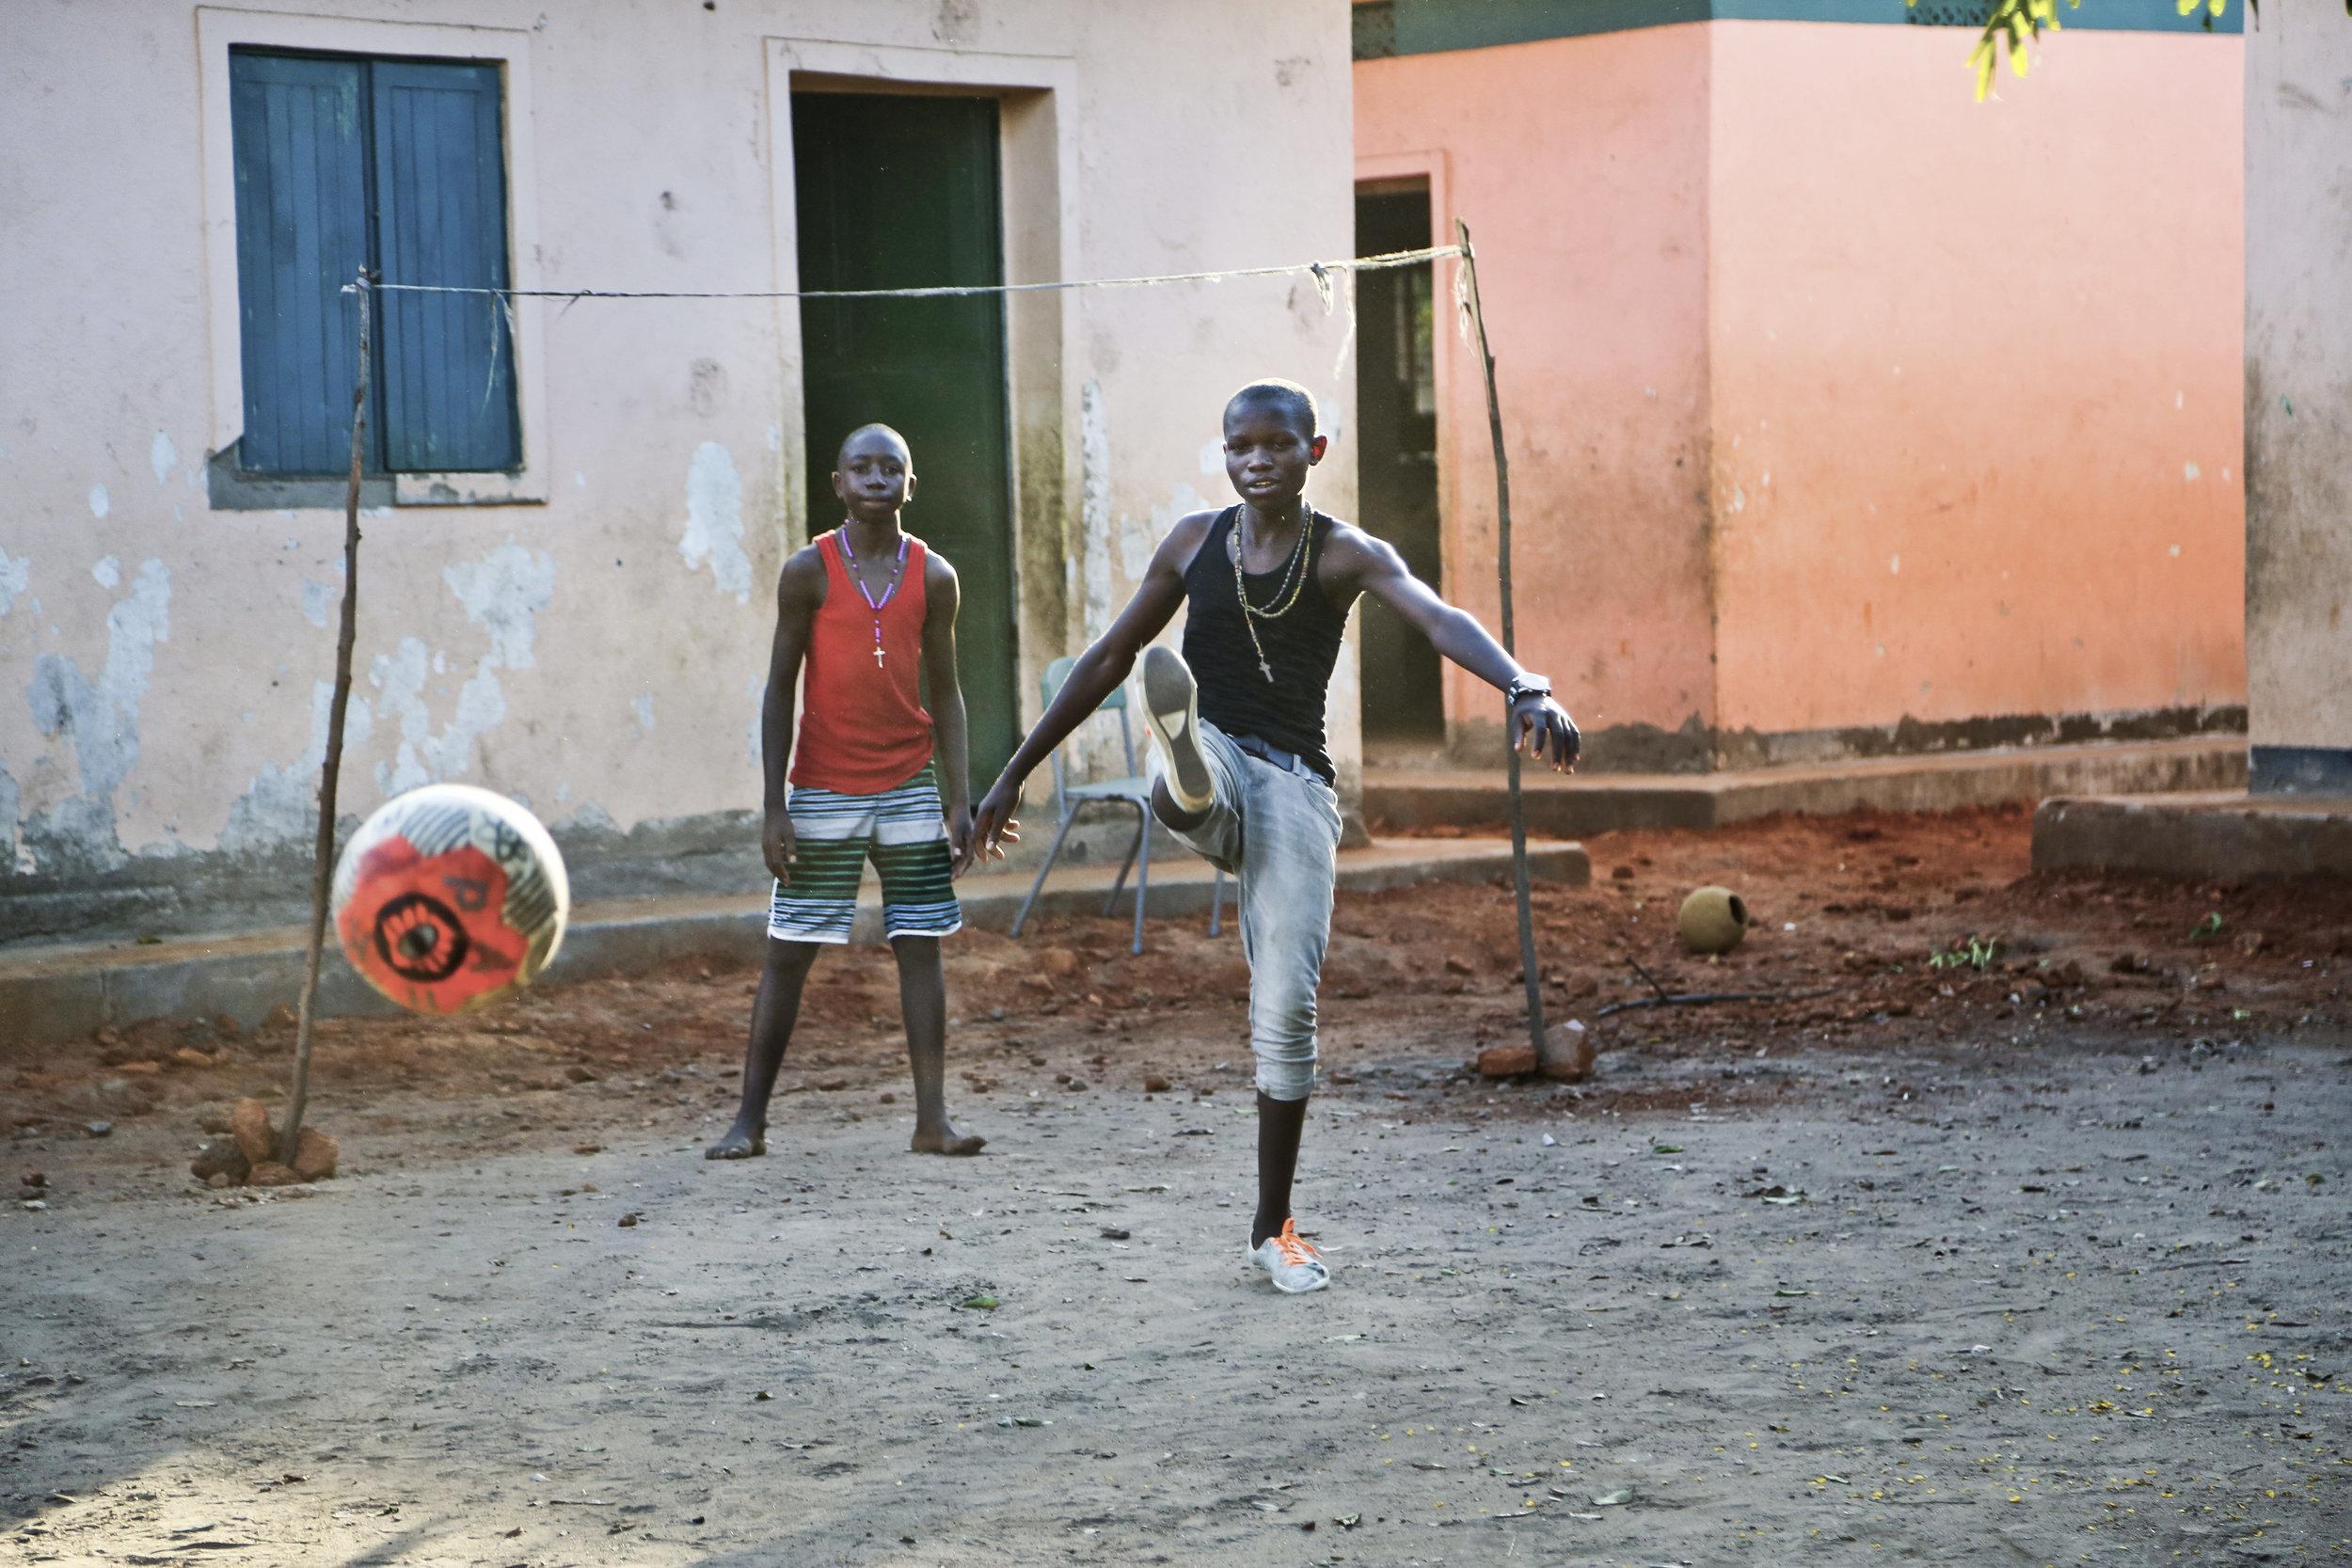 PARK_Uganda2_phcredit_Chelsea_Dennison.jpg